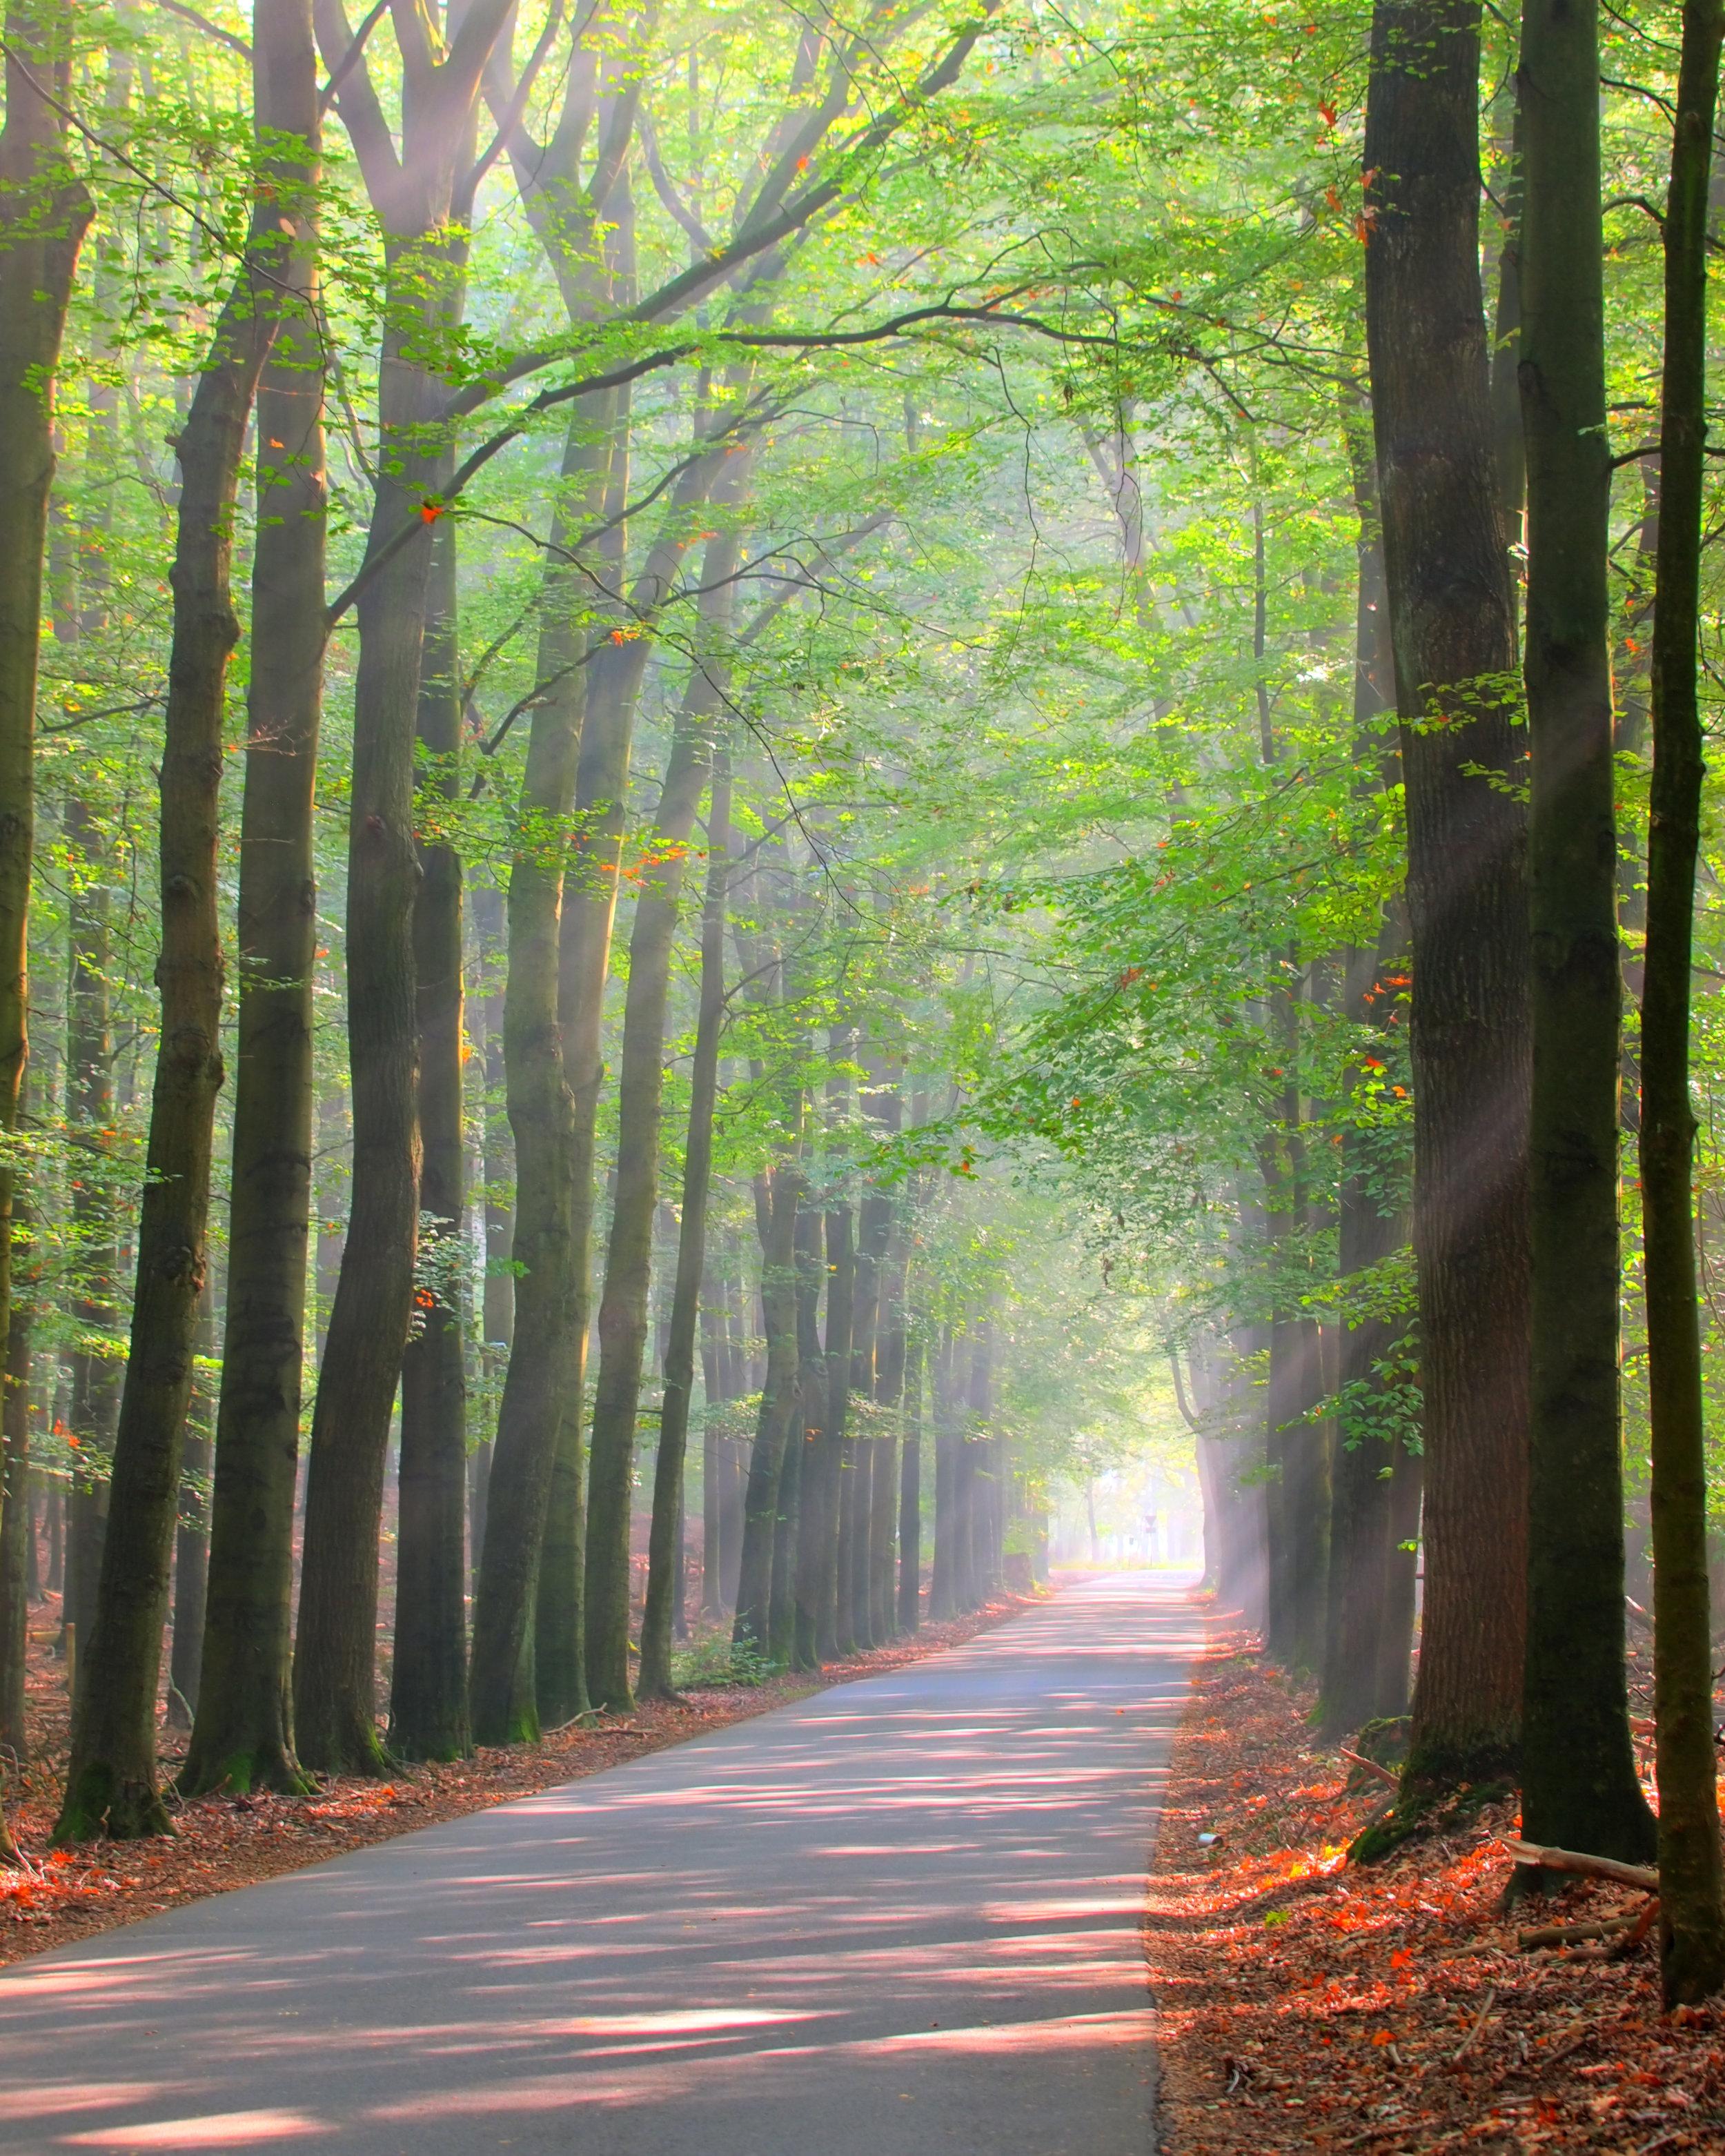 brightly-lit-forest-lane-P9BCNZP.jpg